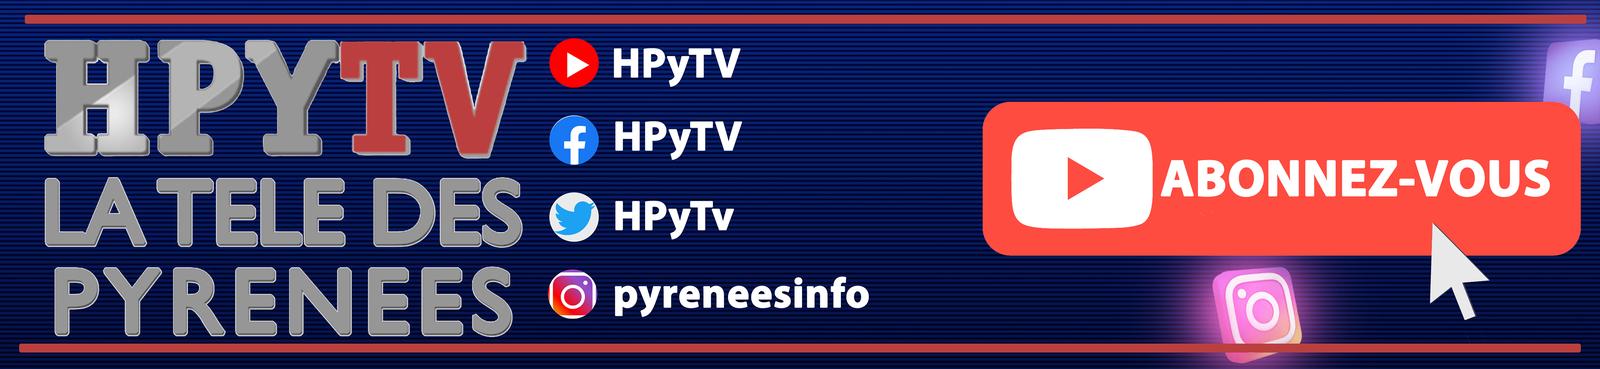 https://www.youtube.com/channel/UCf1ycwDUU6L-CYCZpsqdpWw?view_as=subscriber